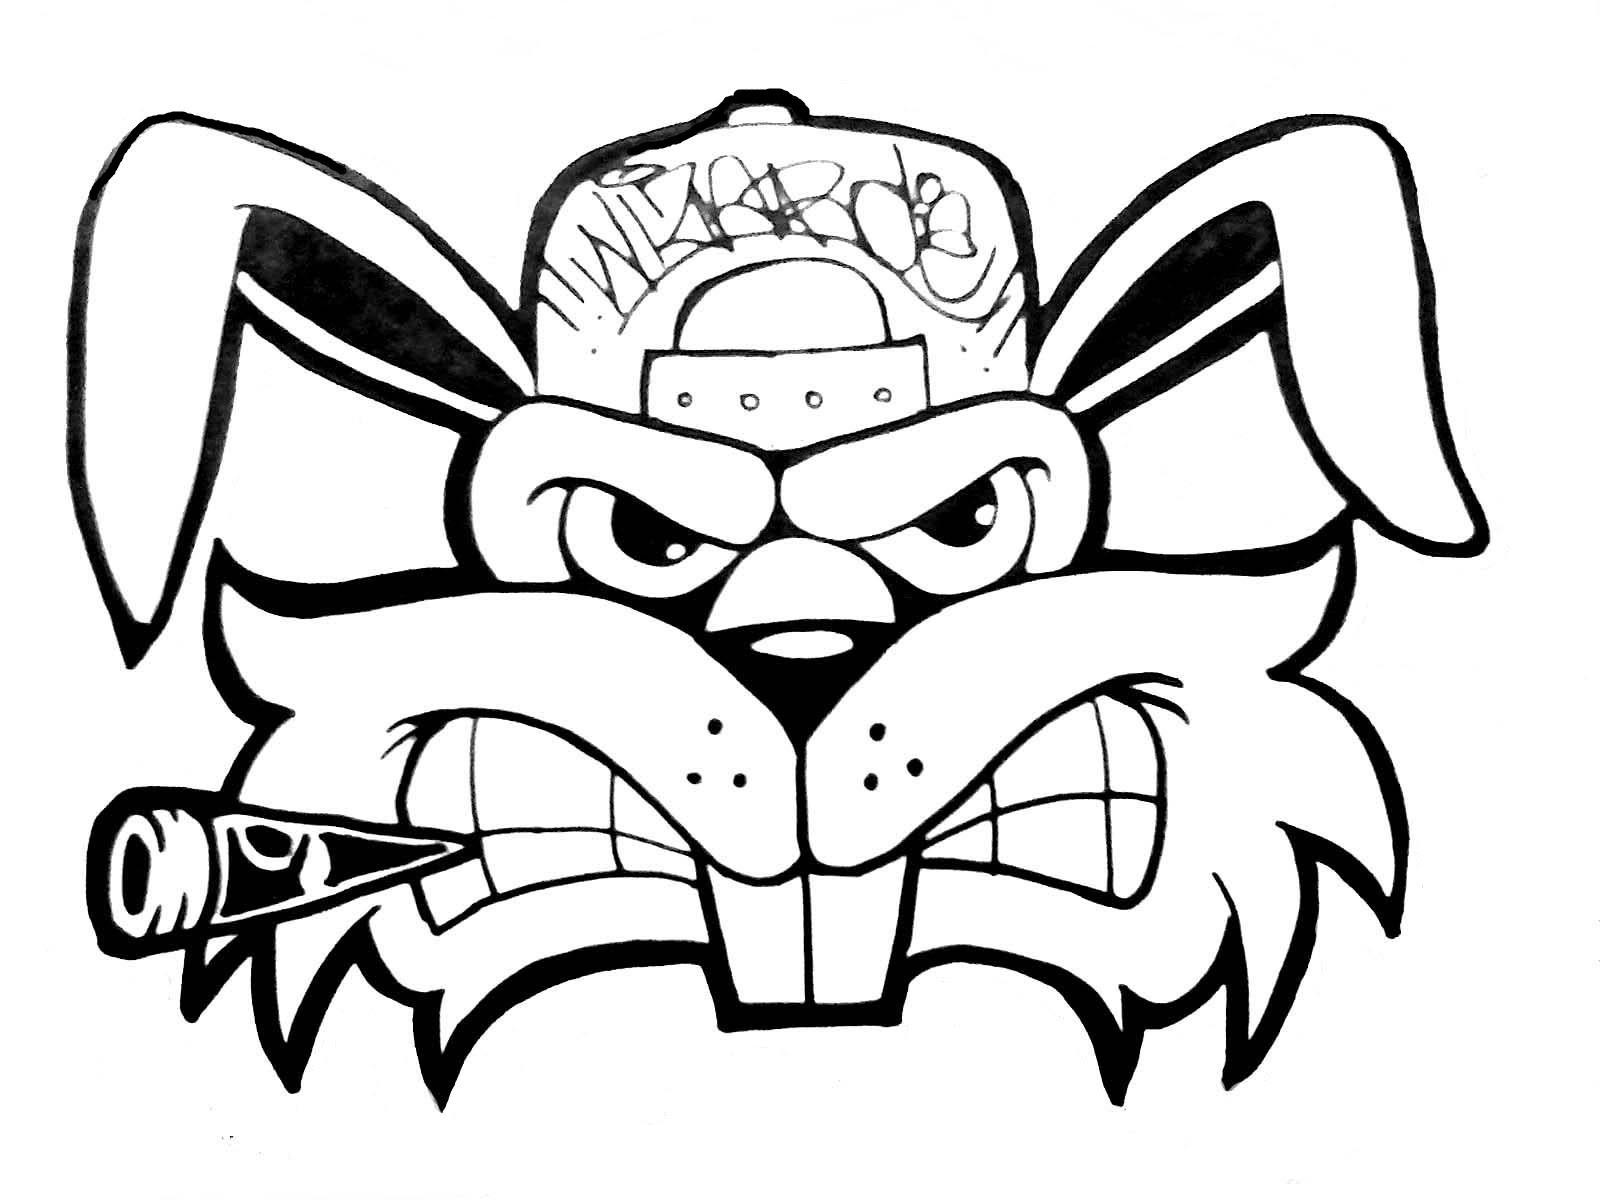 1600x1200 Graffiti Cartoon Drawings How To Draw A Crazy Rabbit (Graffiti